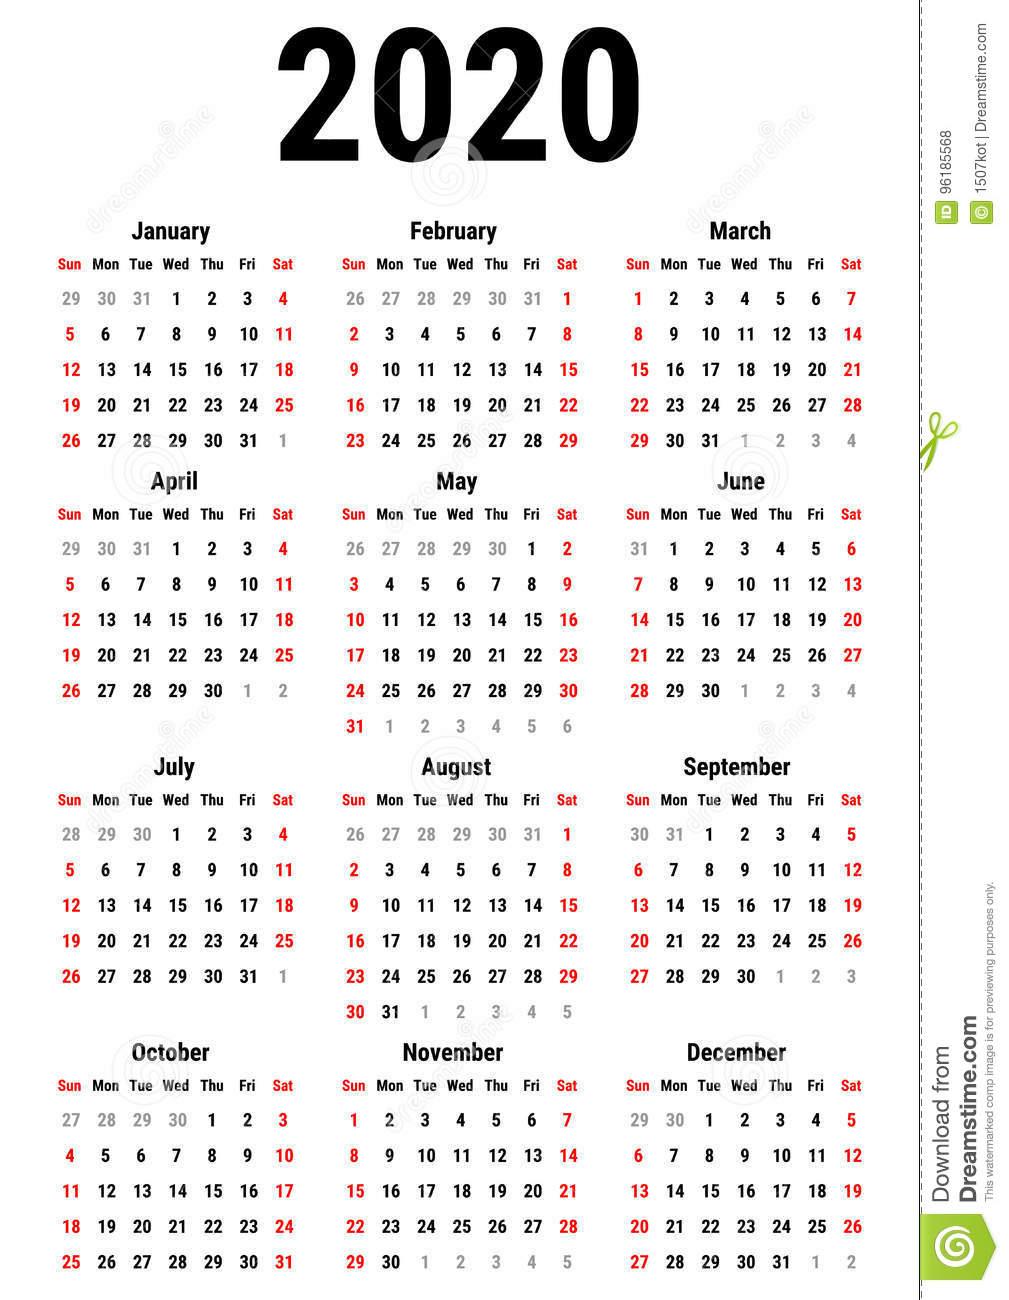 Mcgreers 2021 | Calendar Printables Free Blank for Printable Yearly Shift Rota Calendars 2021 Free